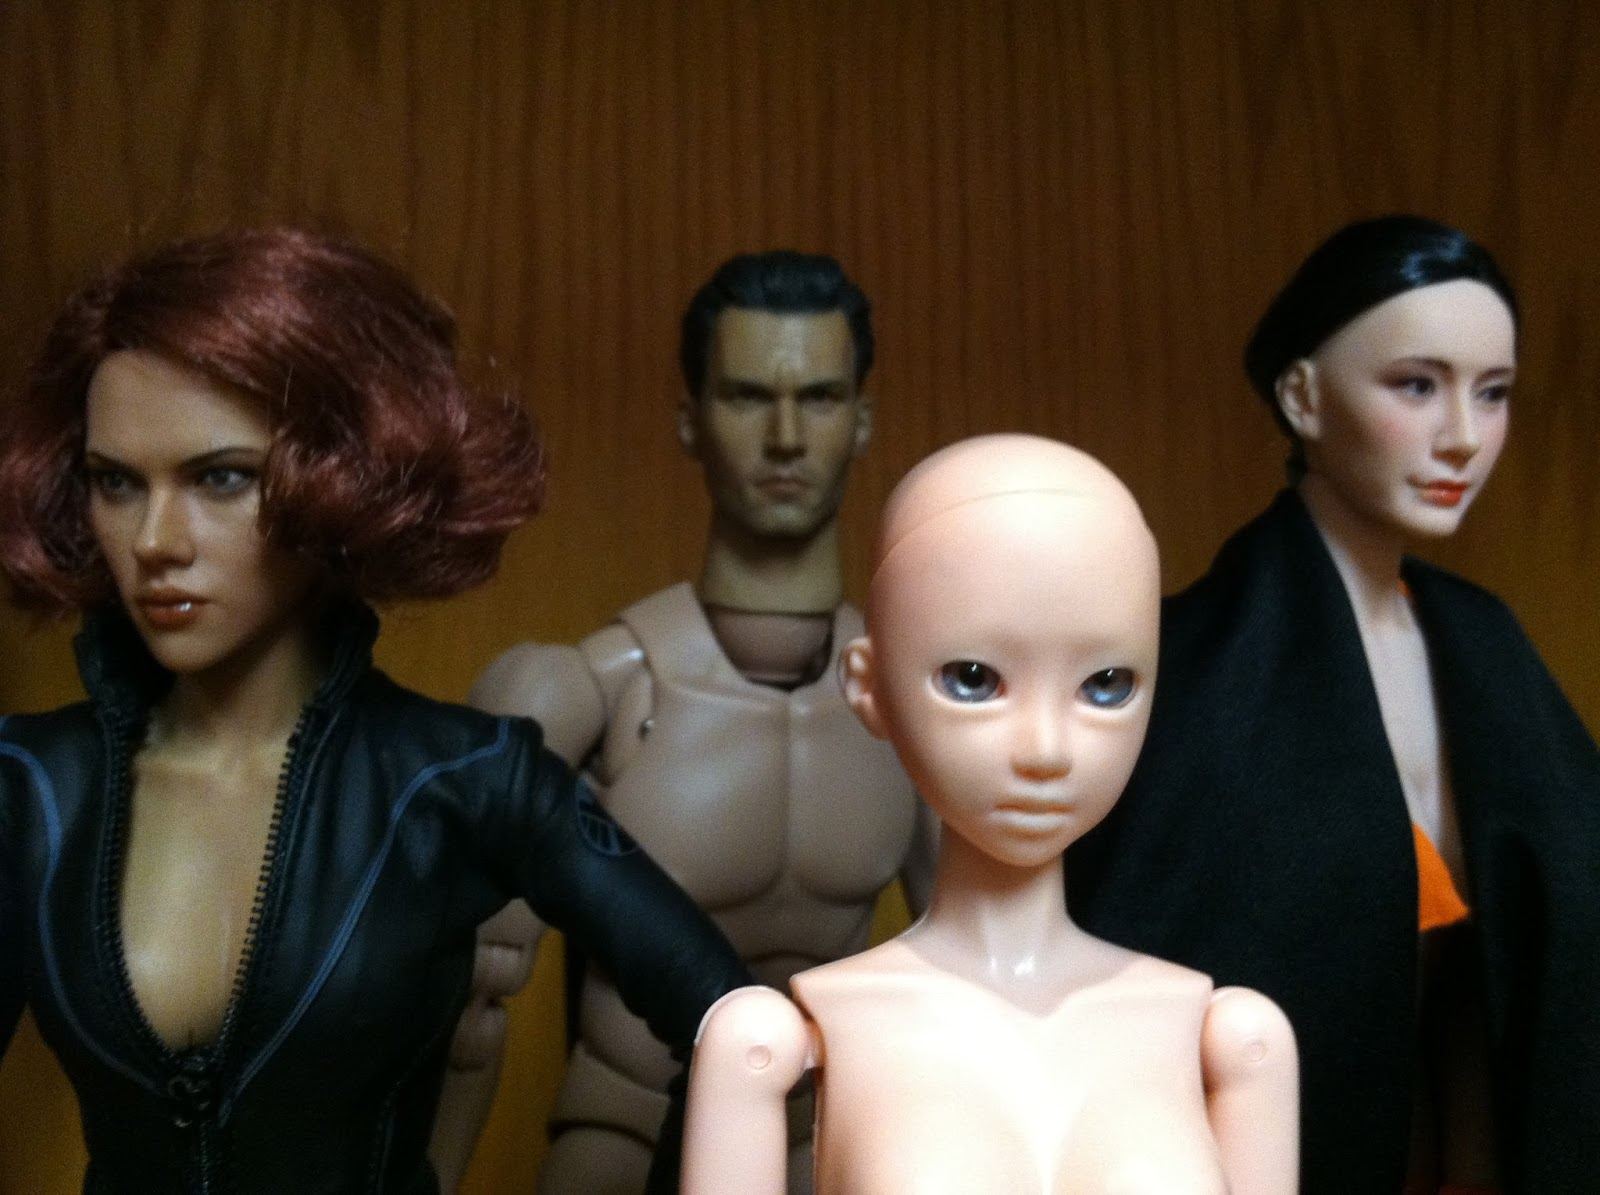 Studio Equipment: Heads